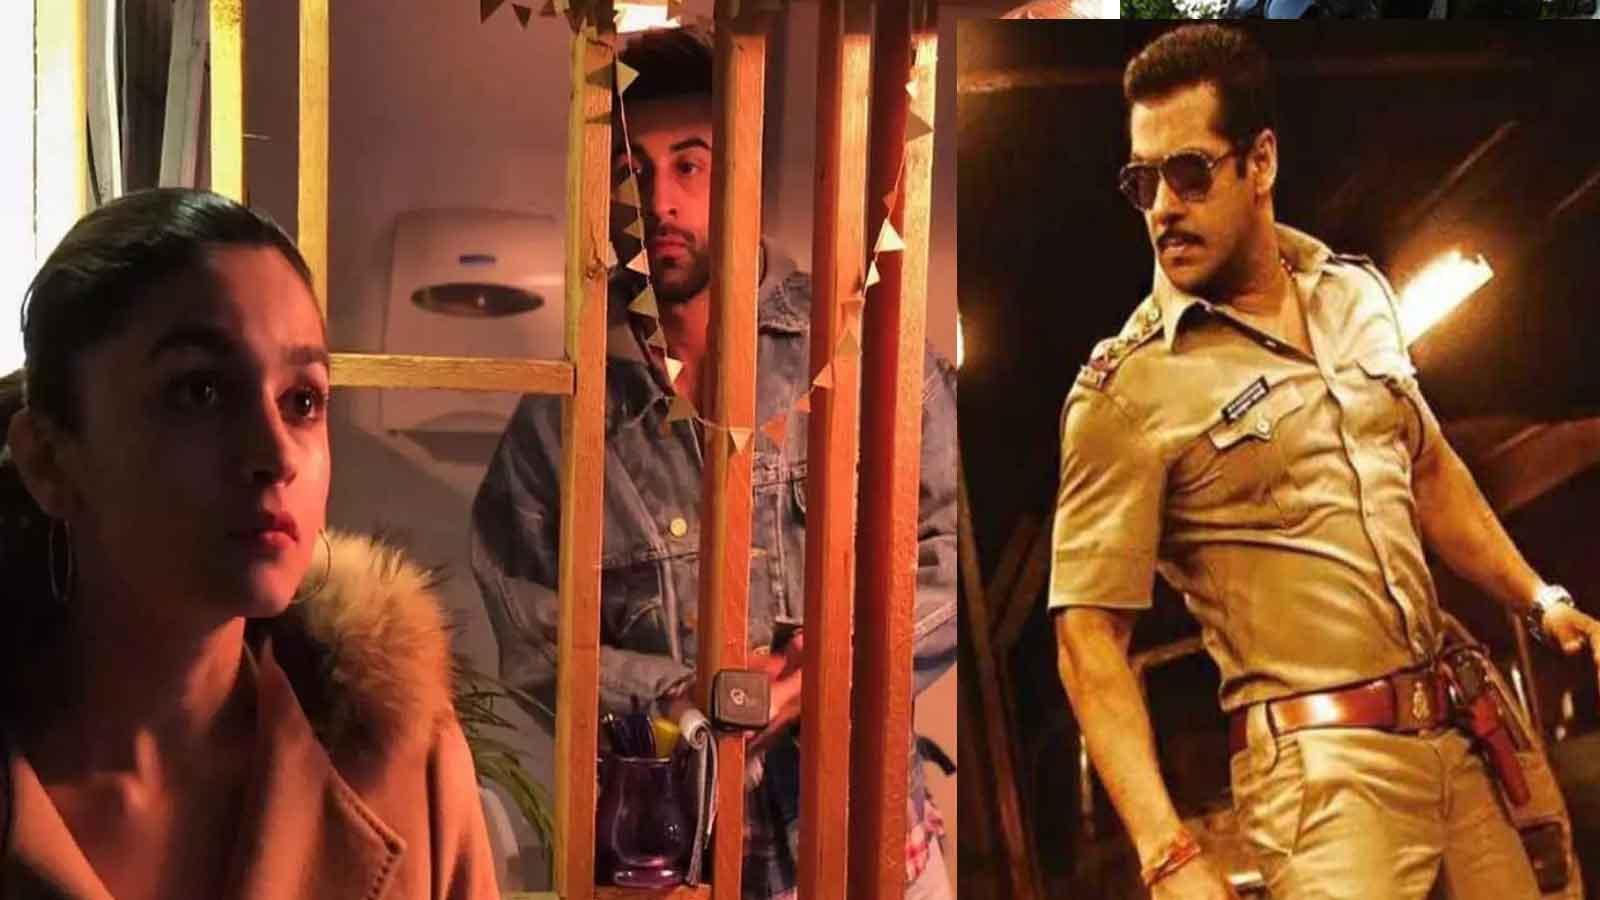 Ranbir Kapoor-Alia Bhatt's 'Brahmastra' release date postponed, won't lock horns with Salman Khan's 'Dabangg 3'